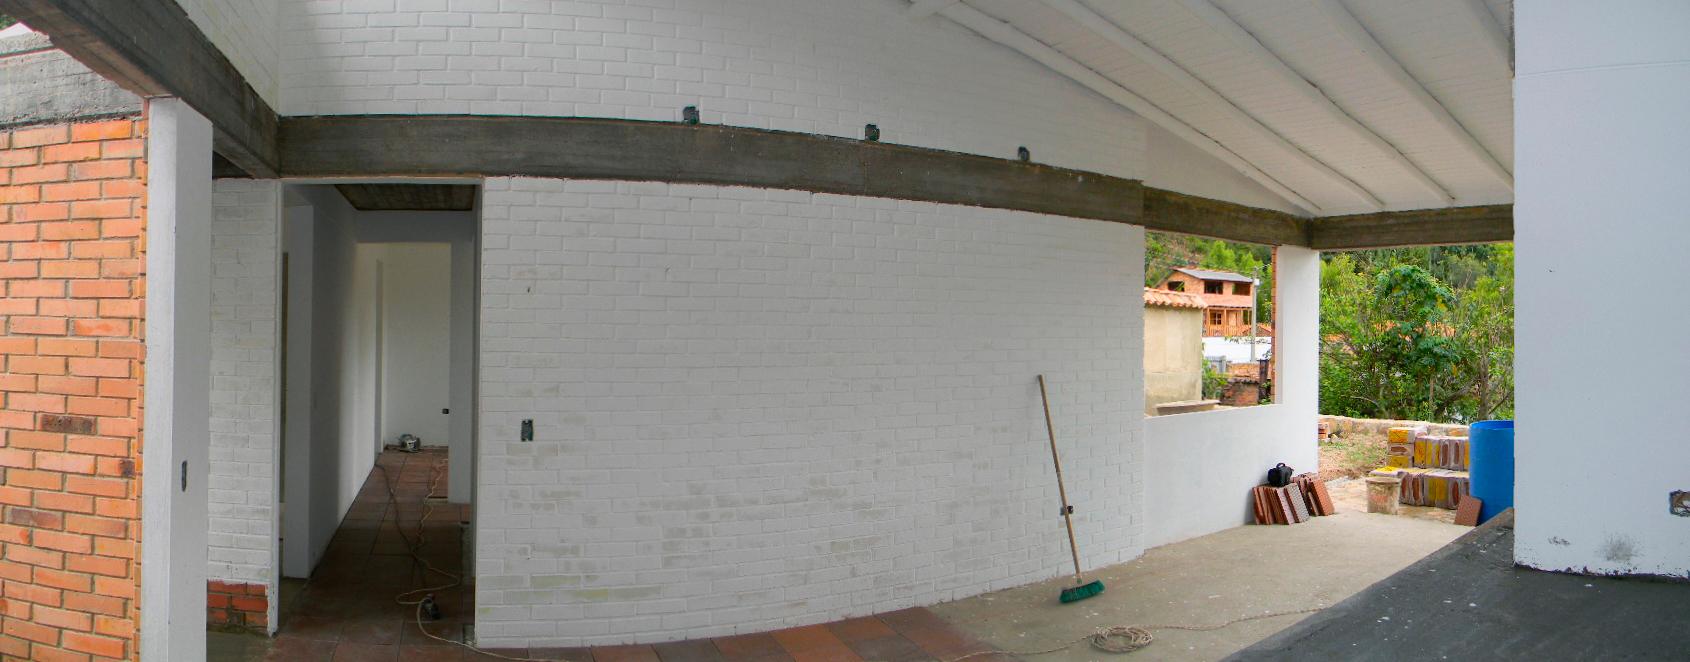 Panorama-34.jpg